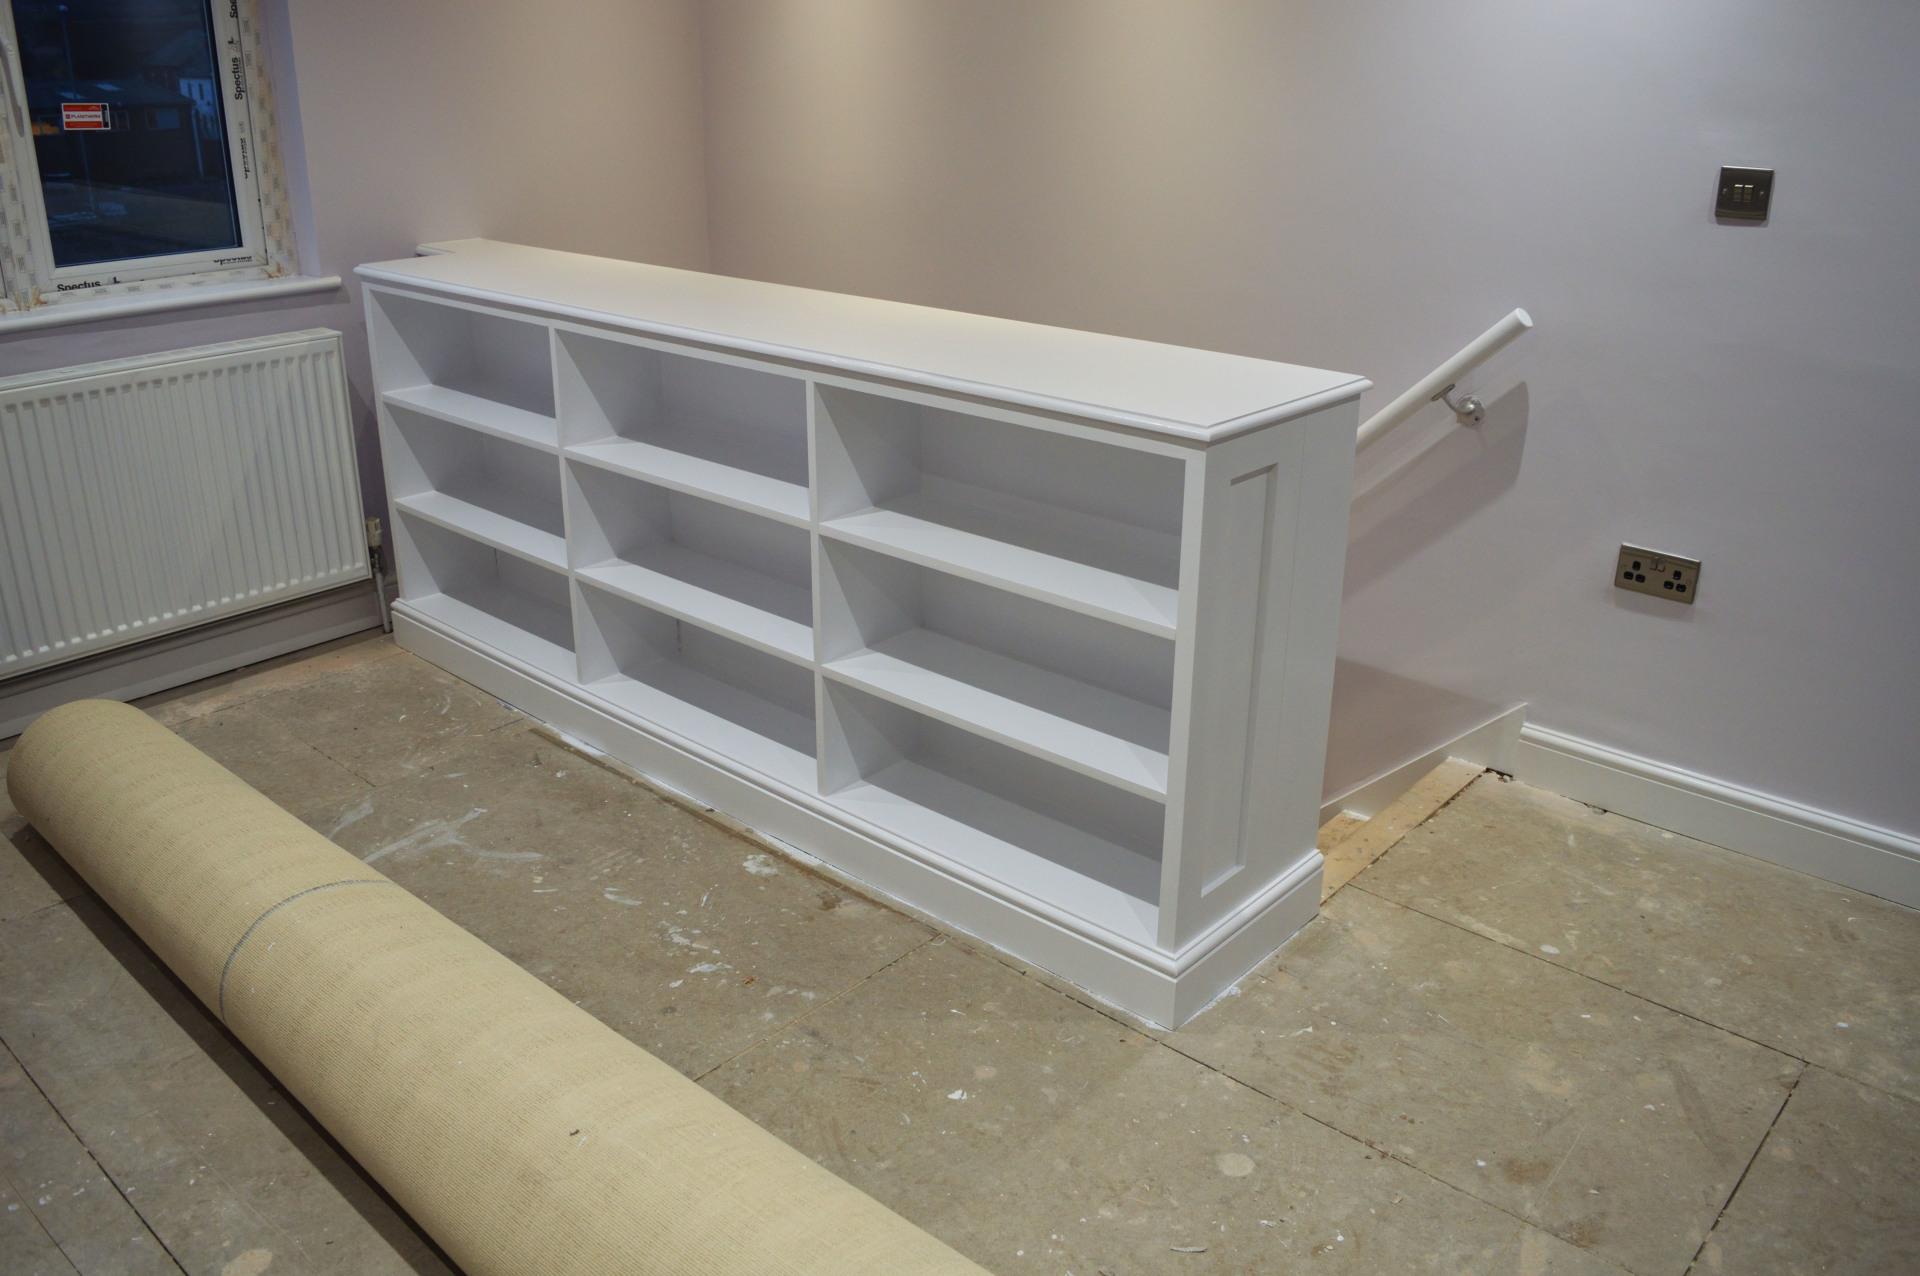 painted shelving unit